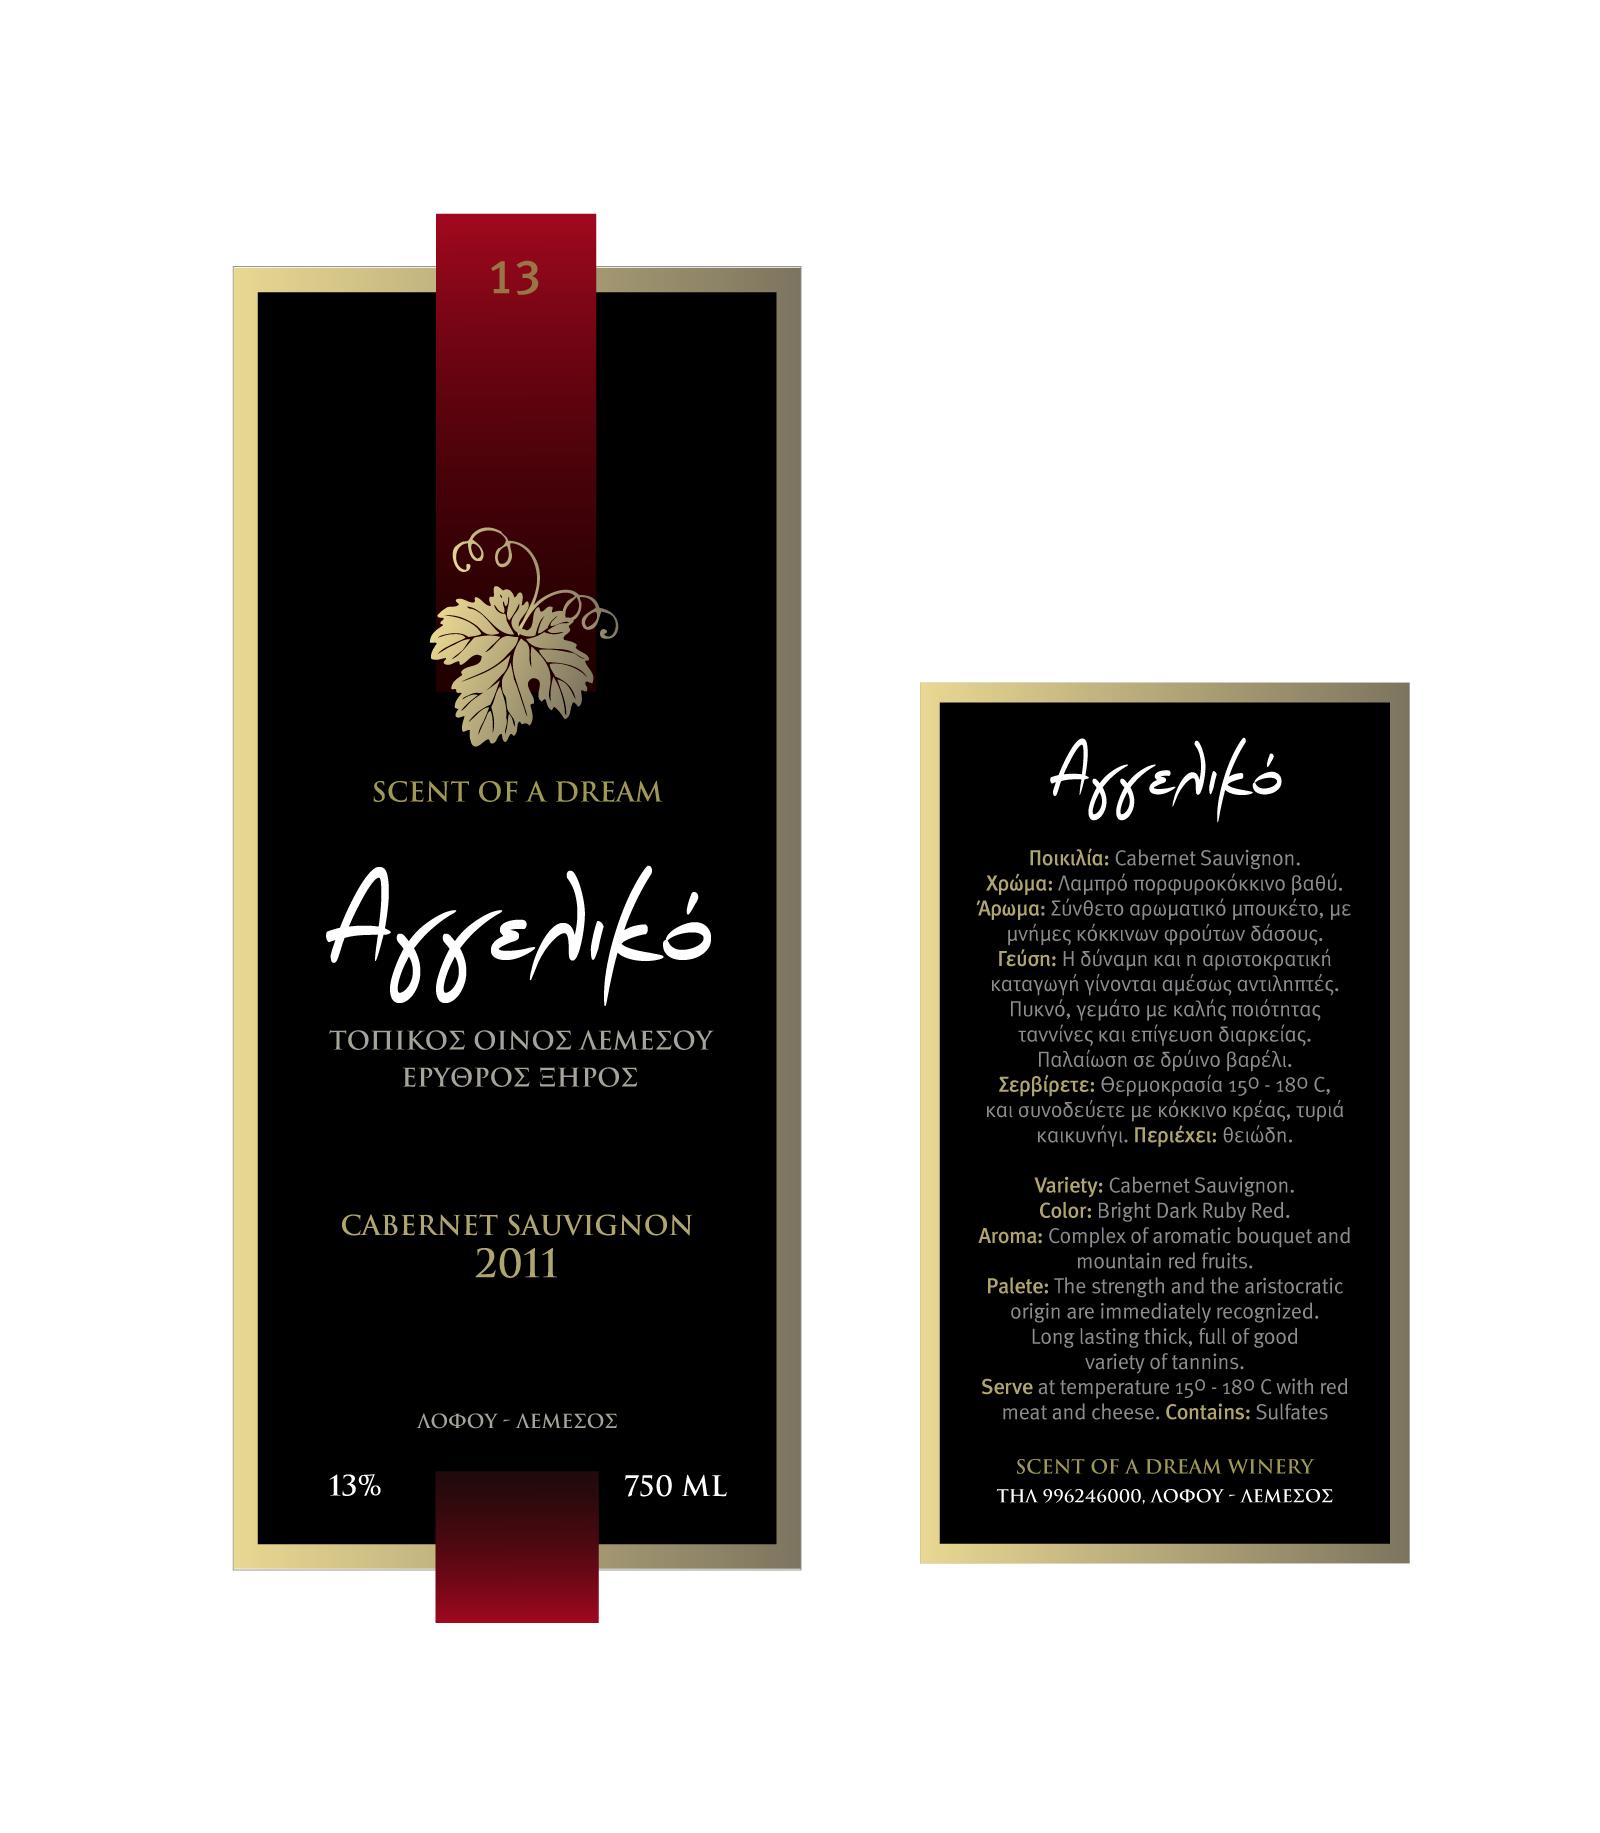 aggeliko_wine_01.png